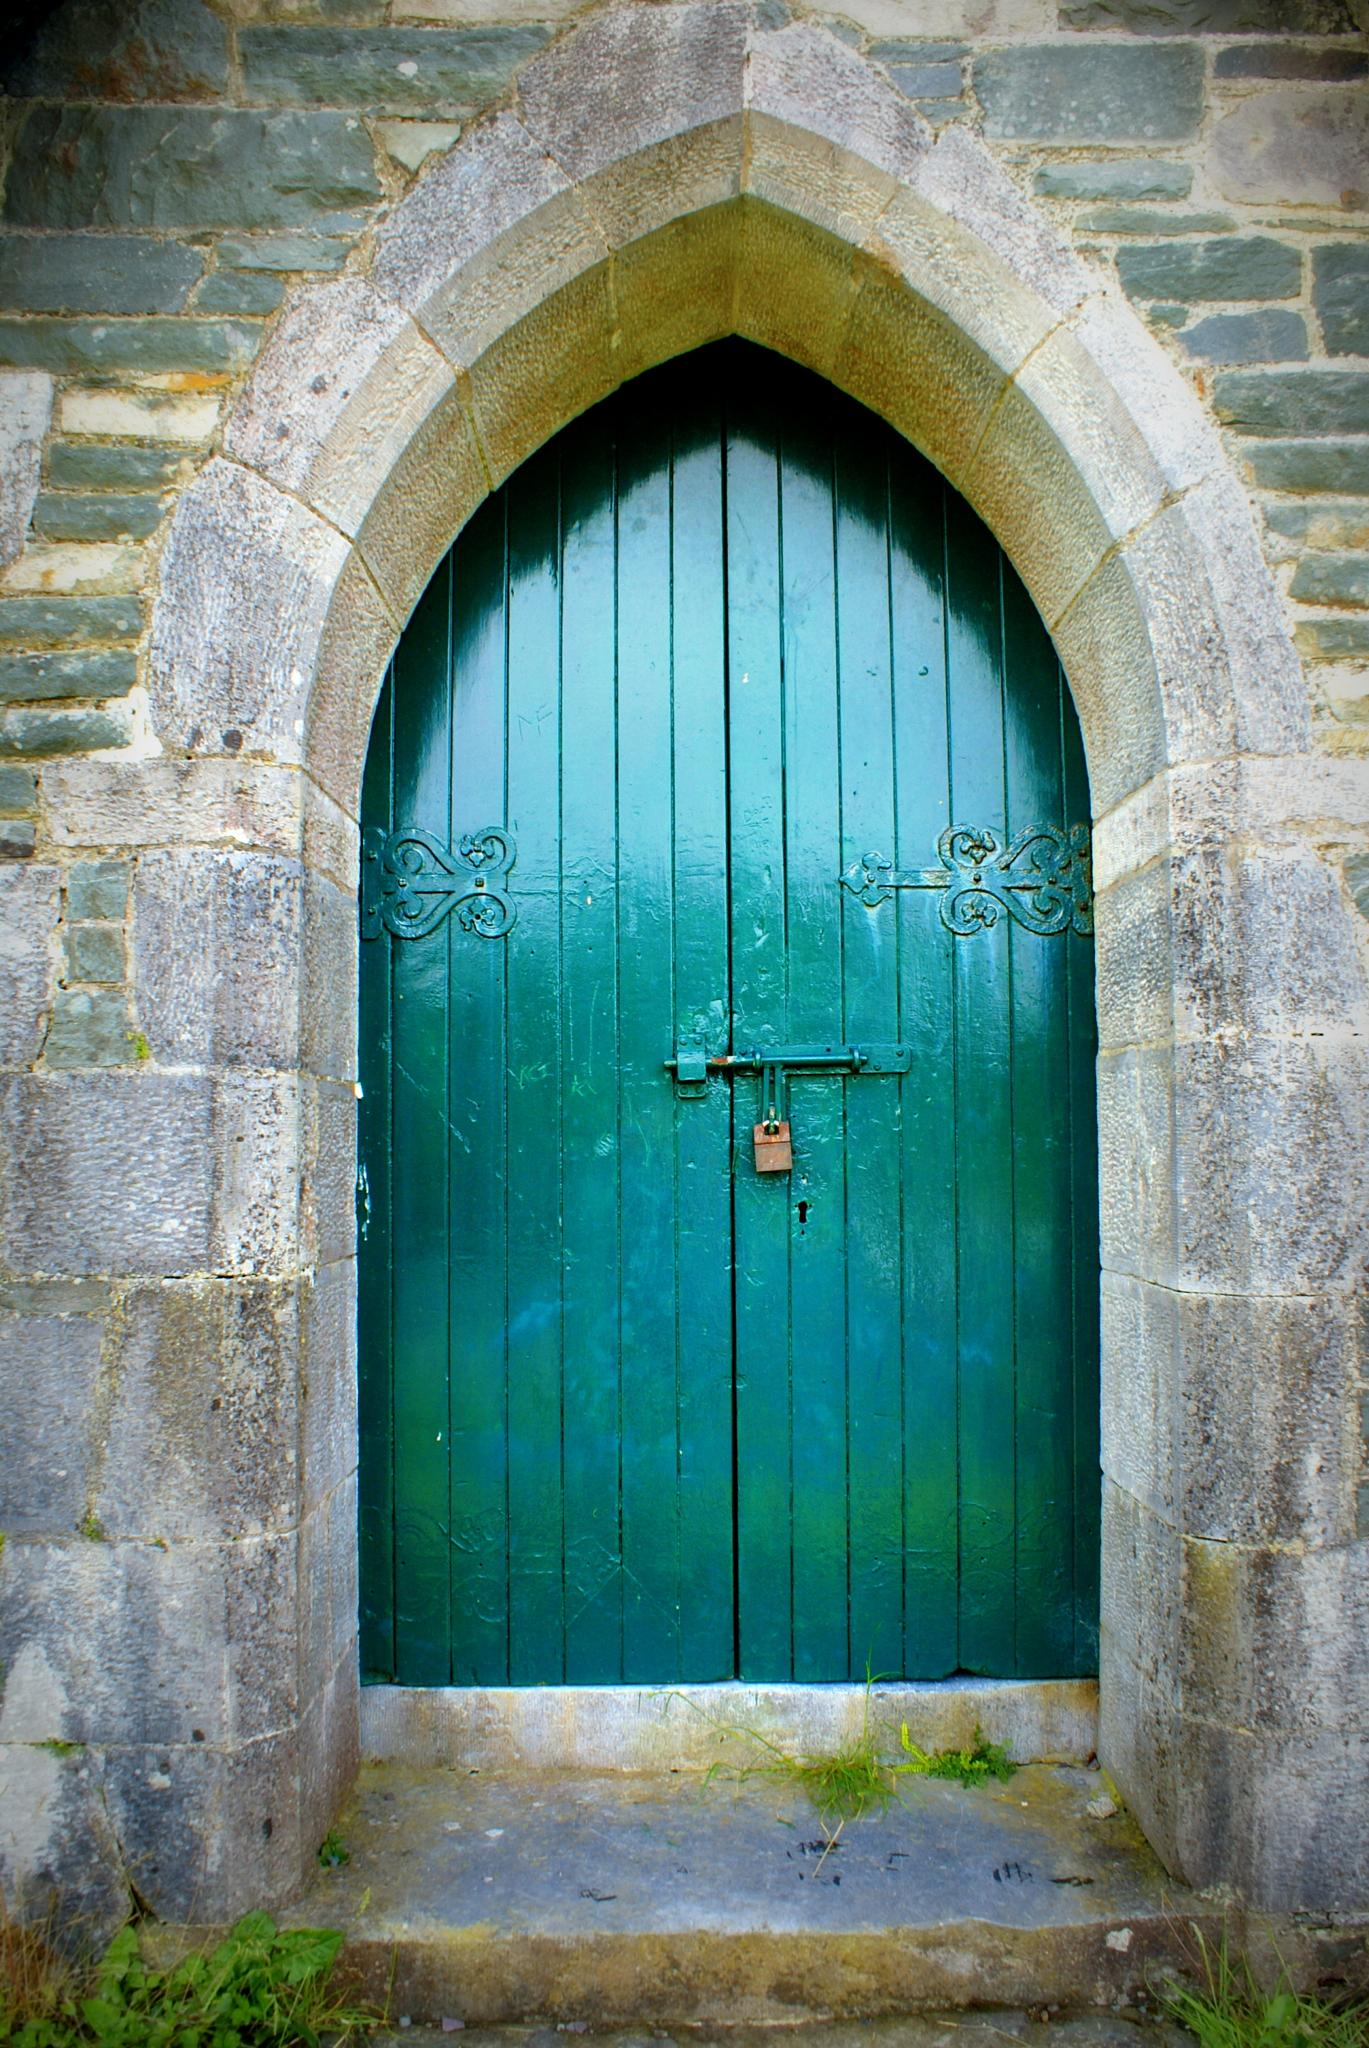 Ireland Church Door by shawna.morgan.7